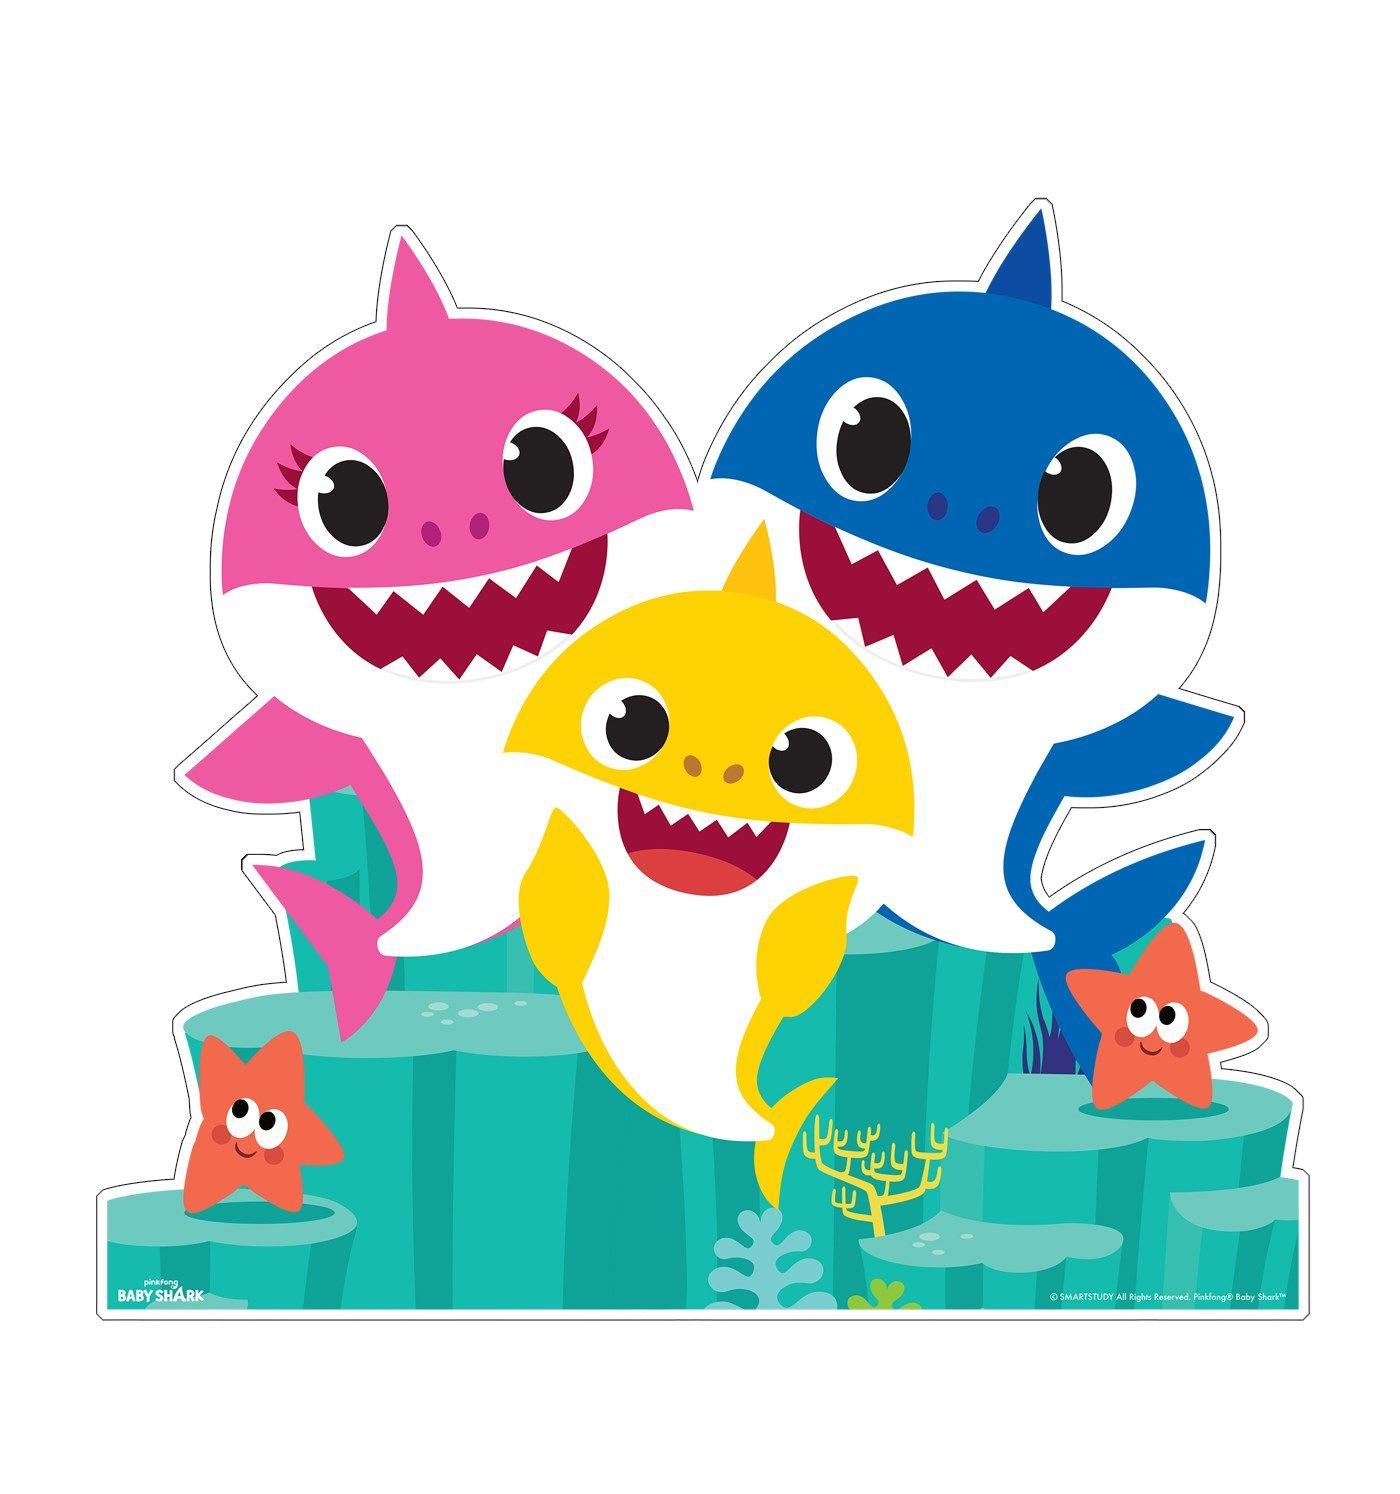 Baby Shark Family Group Cardboard StandUp, 4ft, Motion